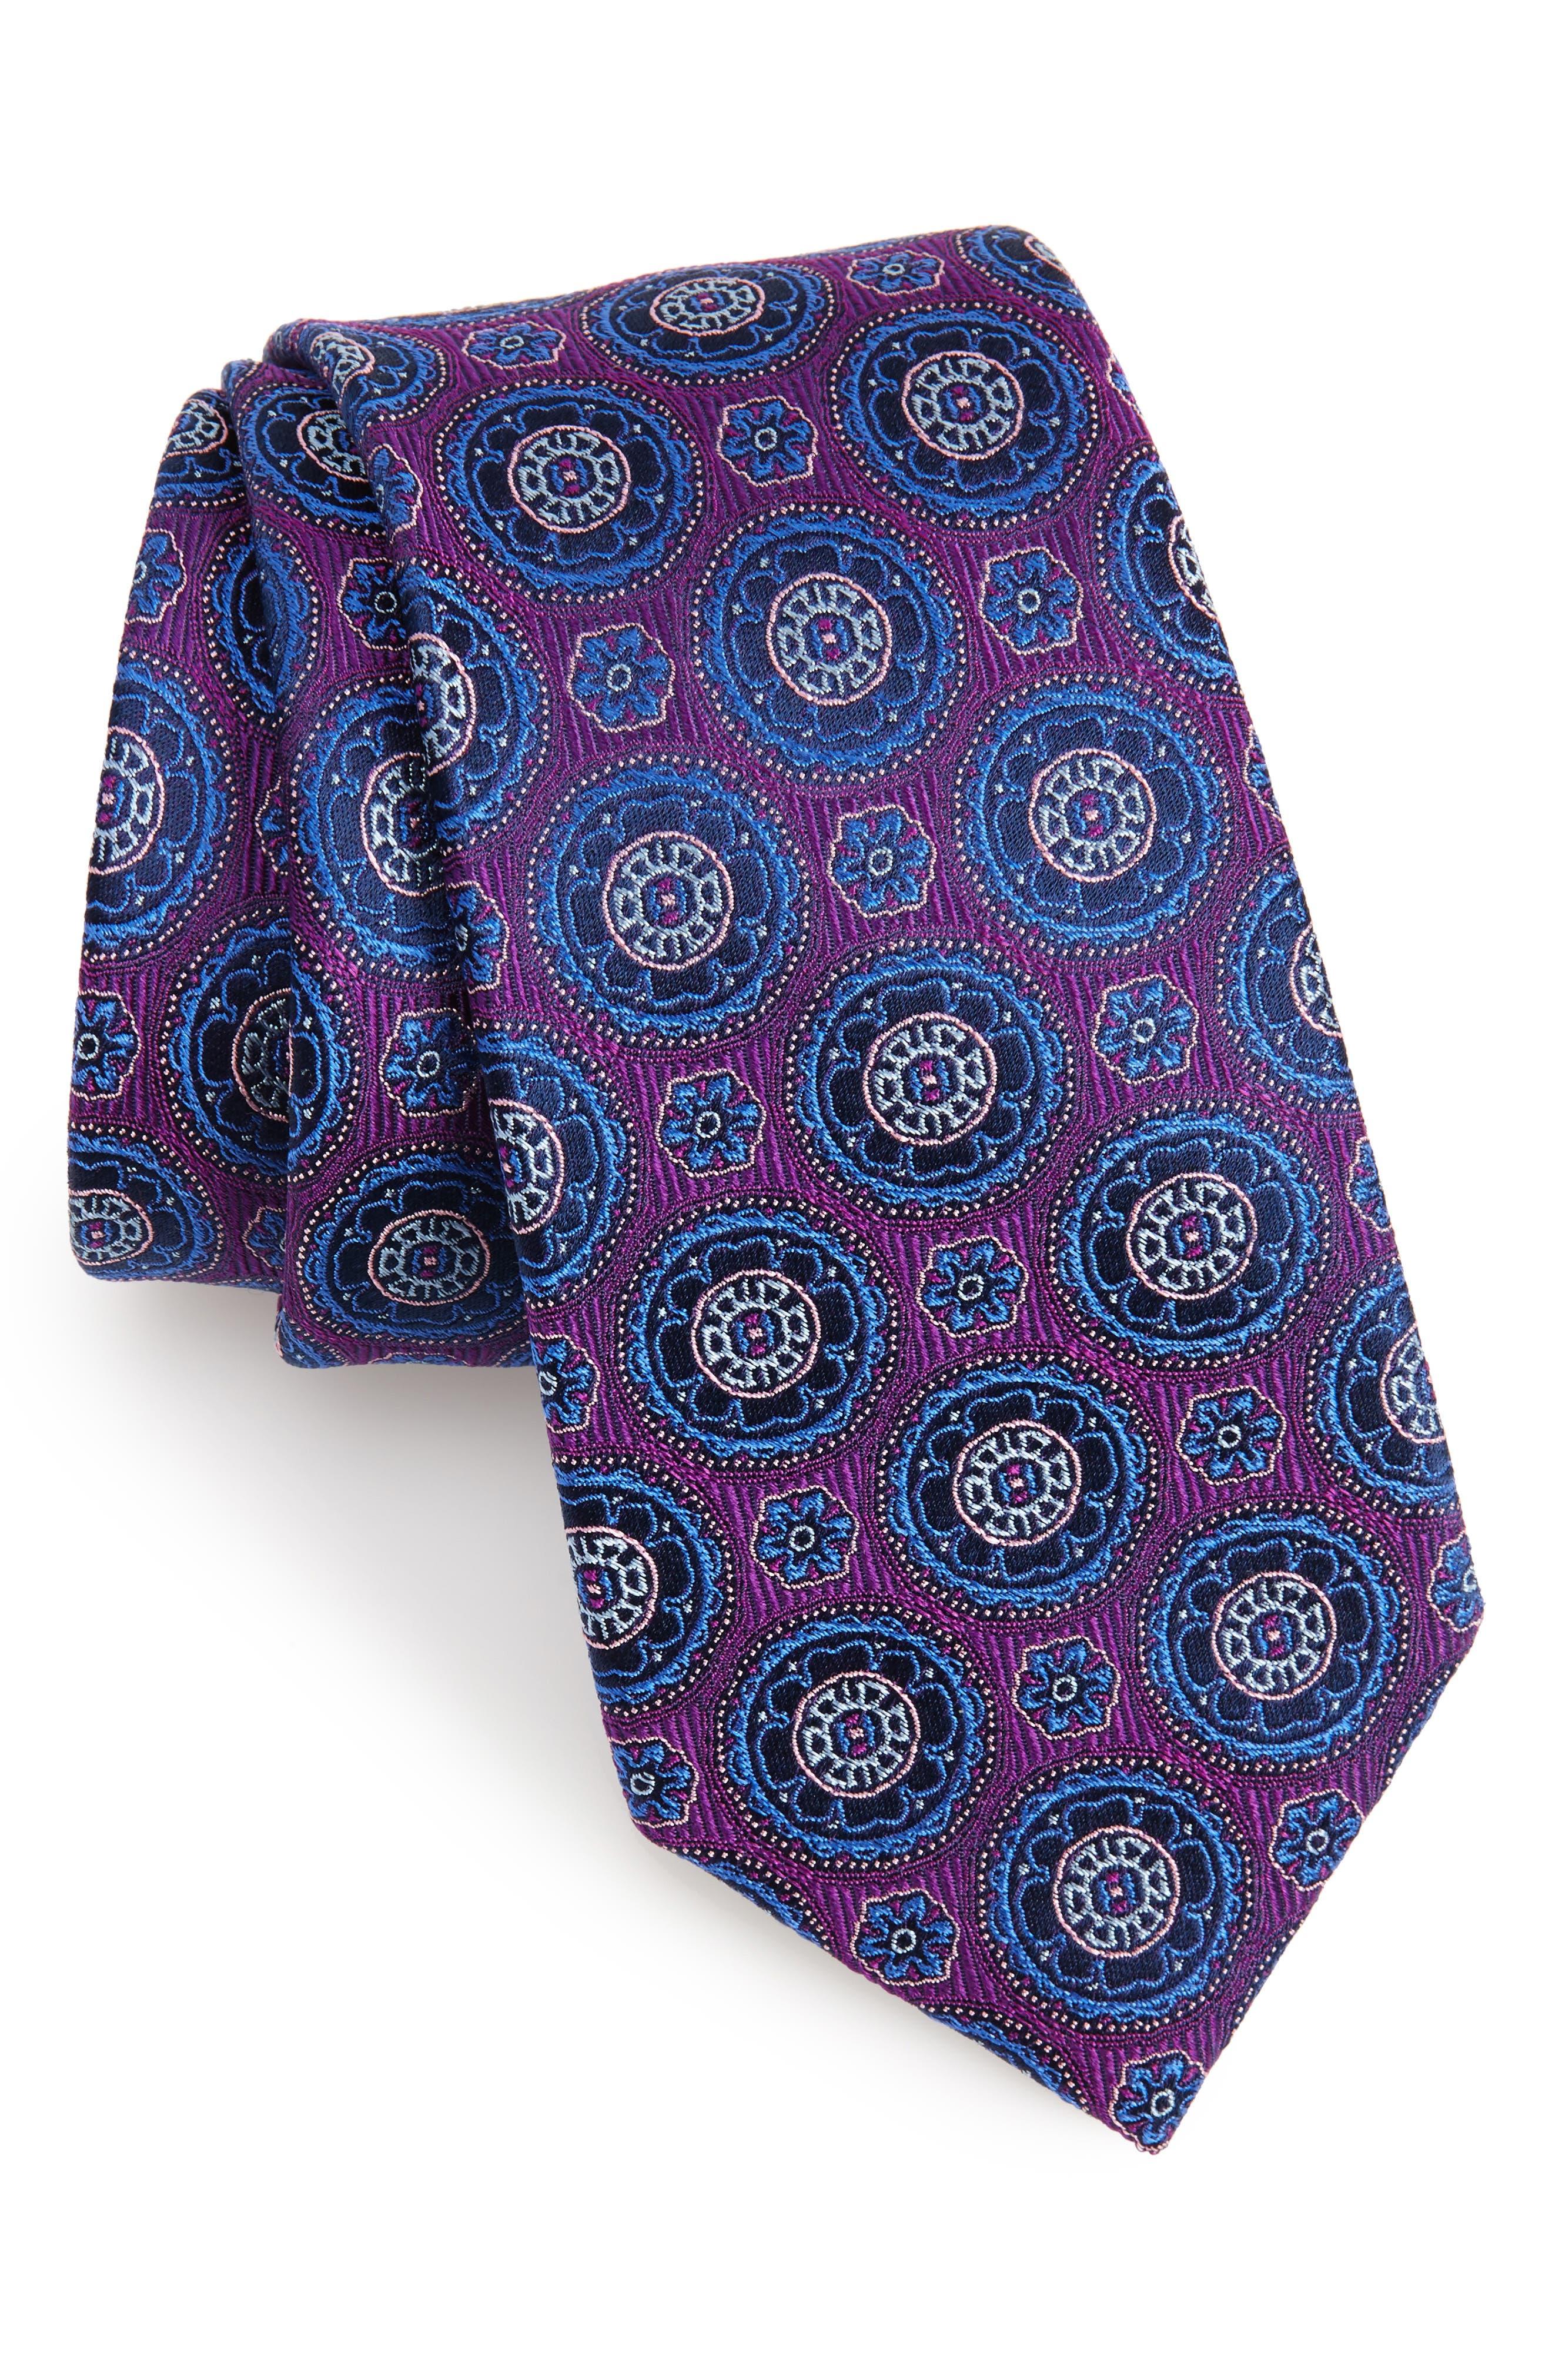 Kensington Medallion Silk Tie,                             Main thumbnail 1, color,                             Purple